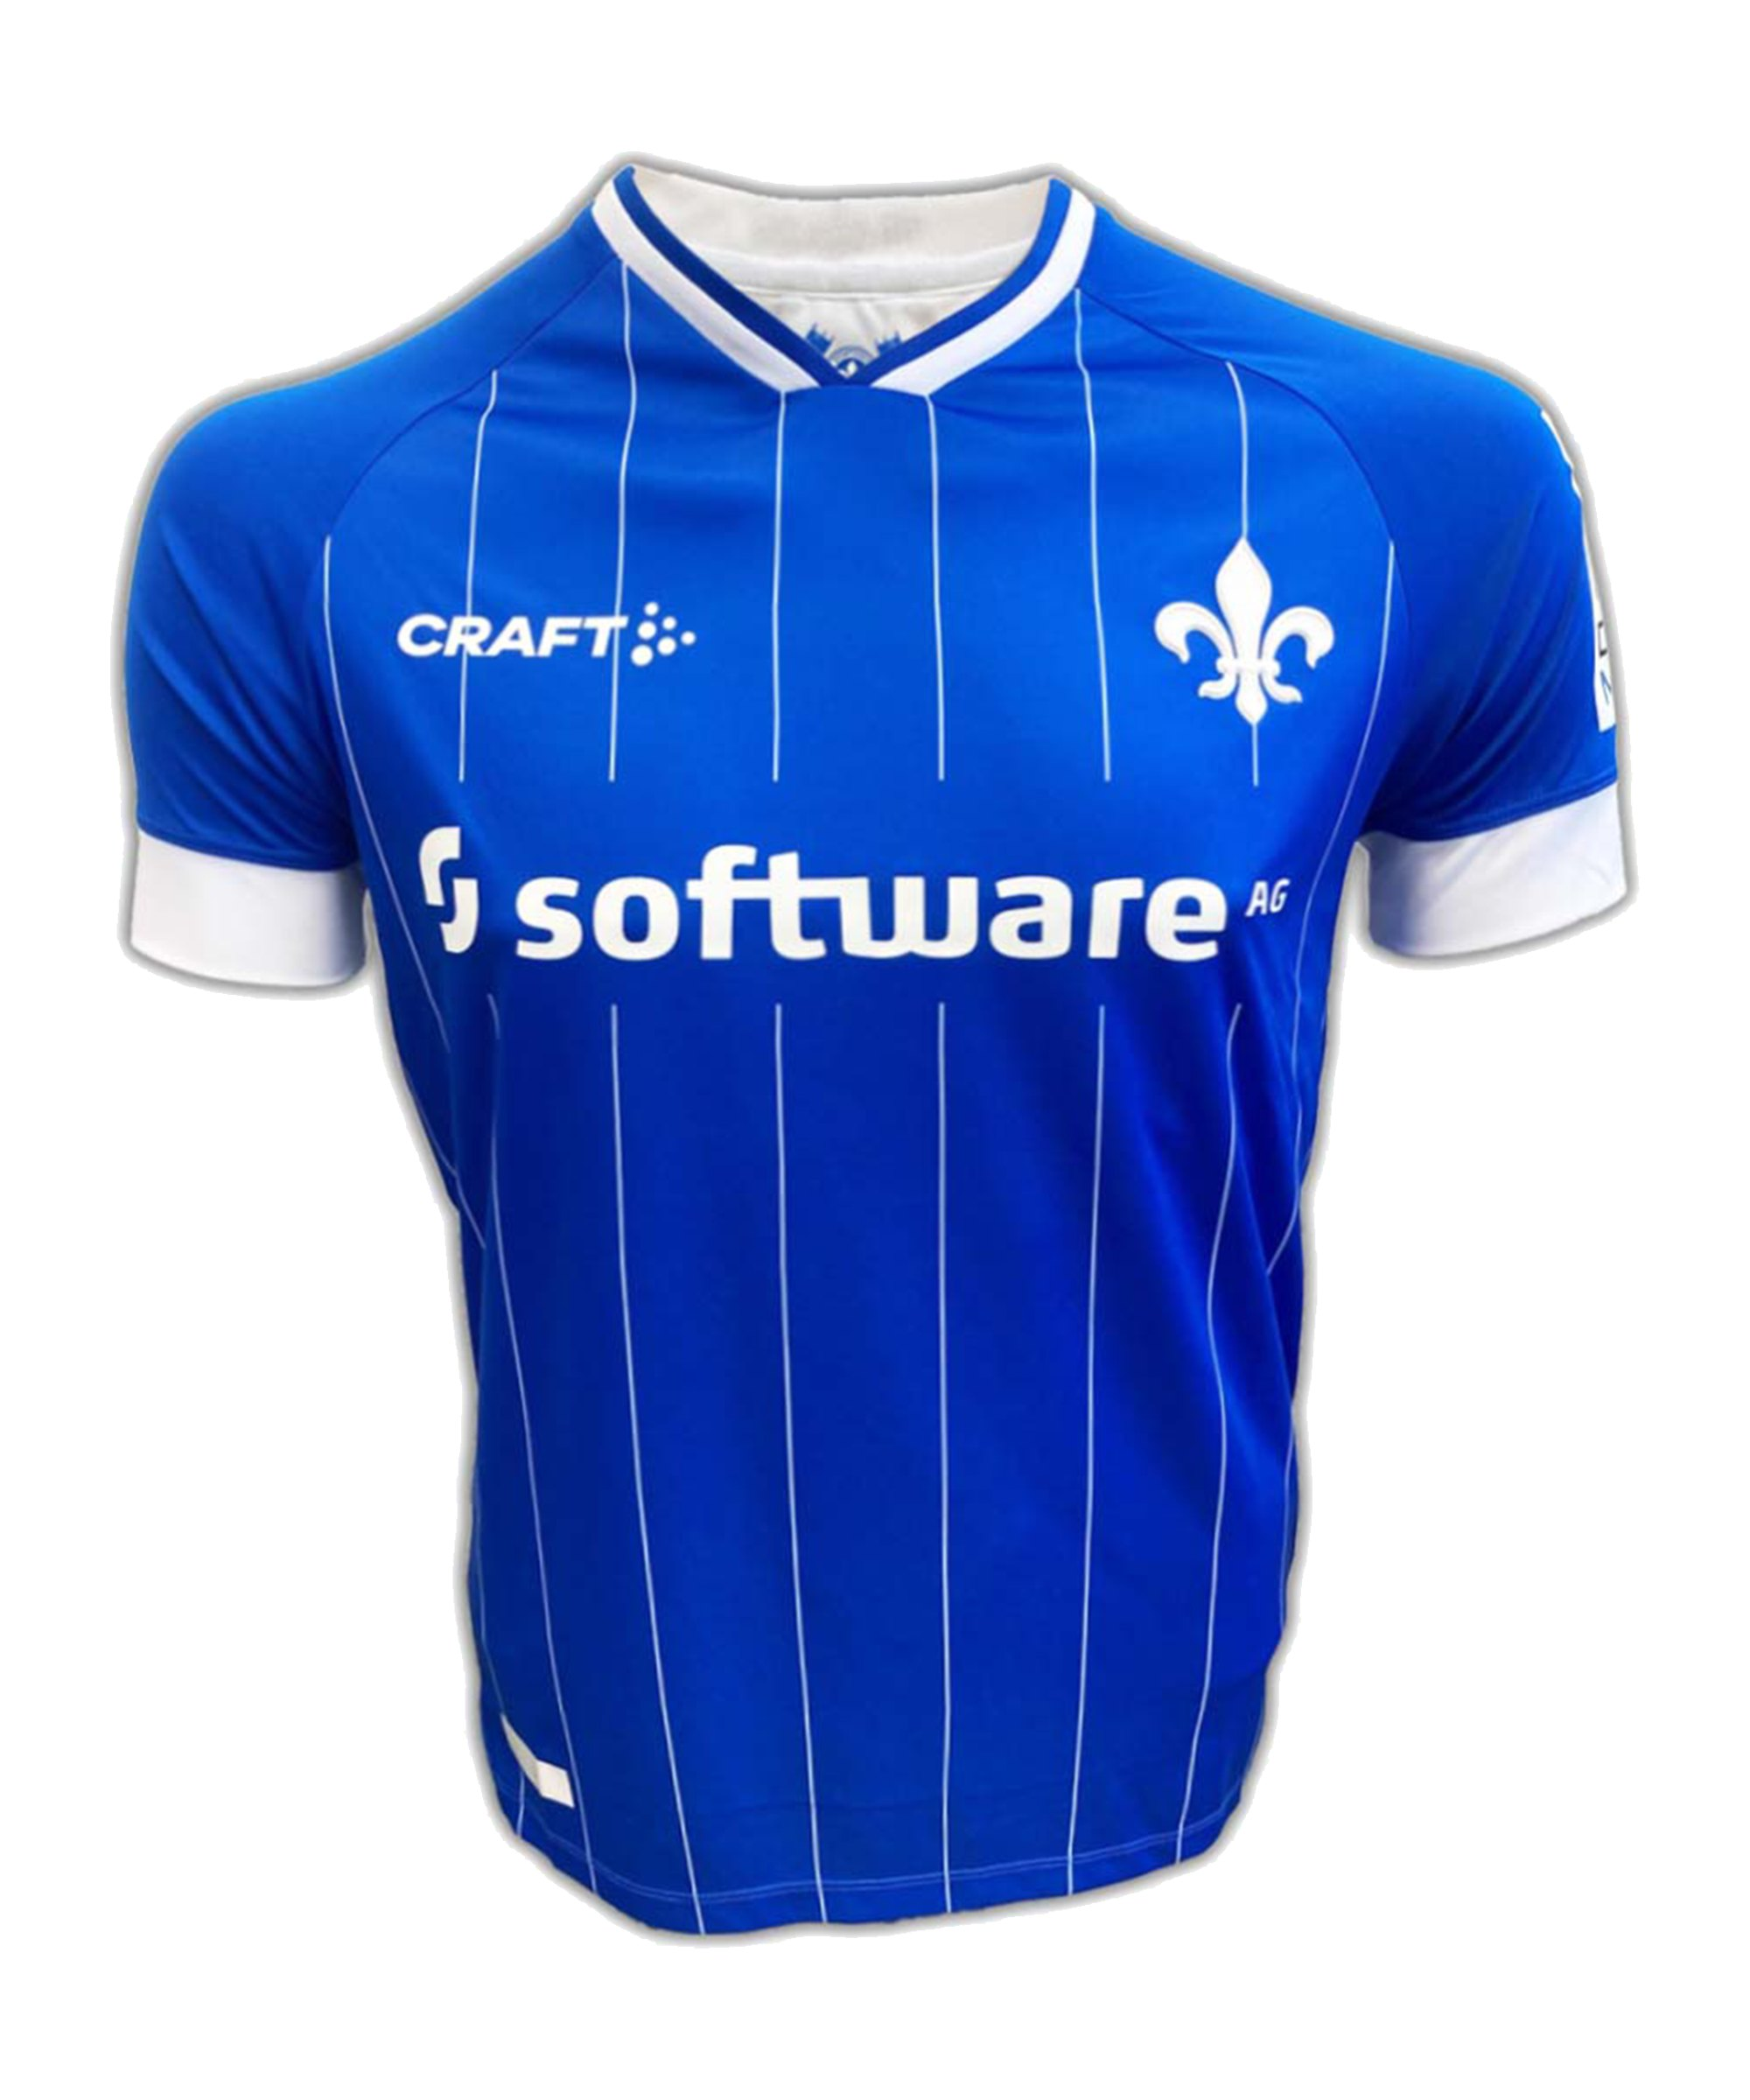 Craft SV Darmstadt 98 Trikot Home 2021/2022 Blau F369900 - blau